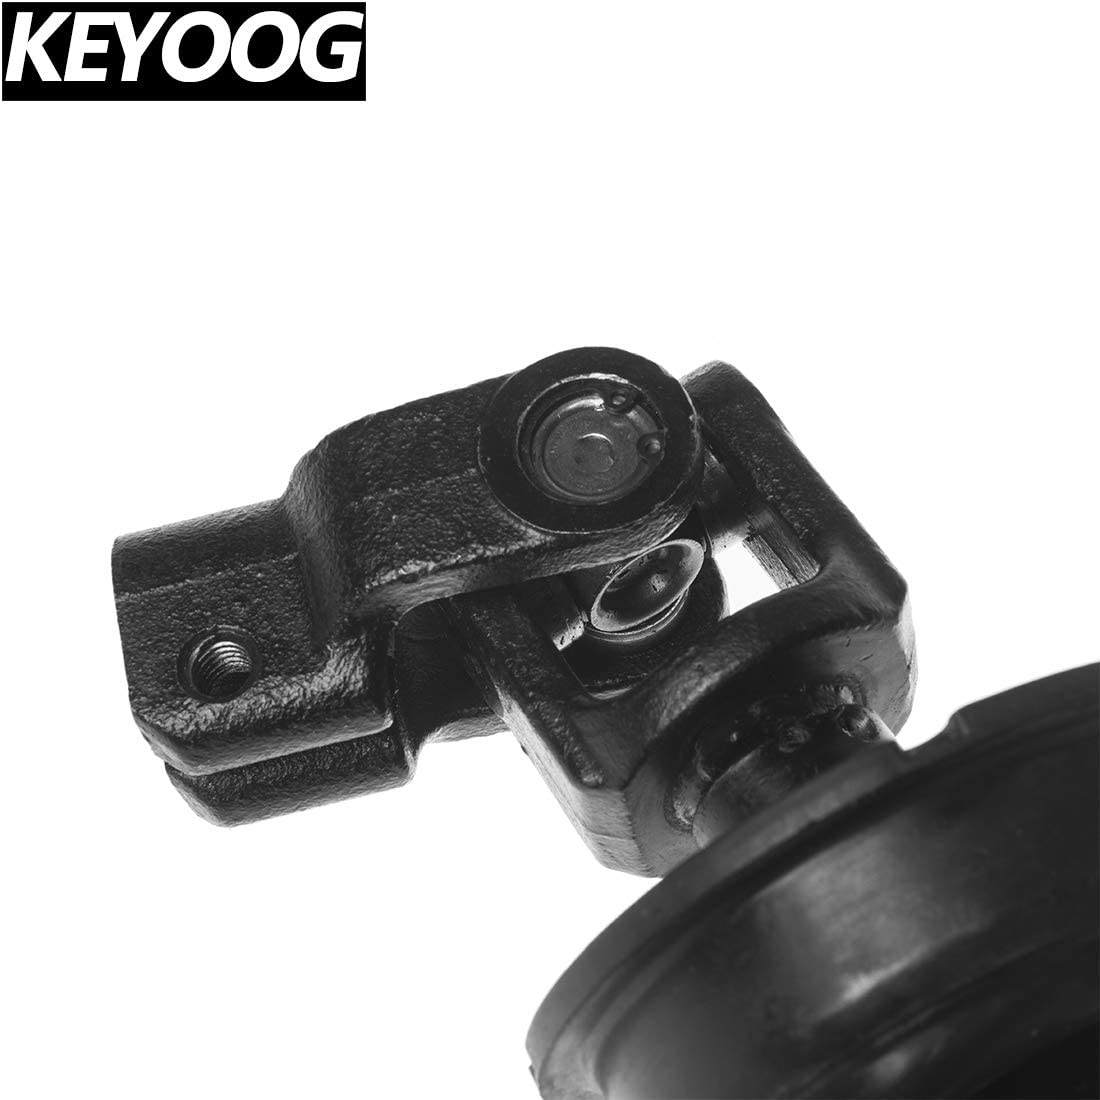 KEYOOG Lower Intermediate Steering Shaft Column for 2007-2012 Lexus ES350 2007-2009 Toyota Camry 2010-2011 Toyota Camry 425-465 45220-06114